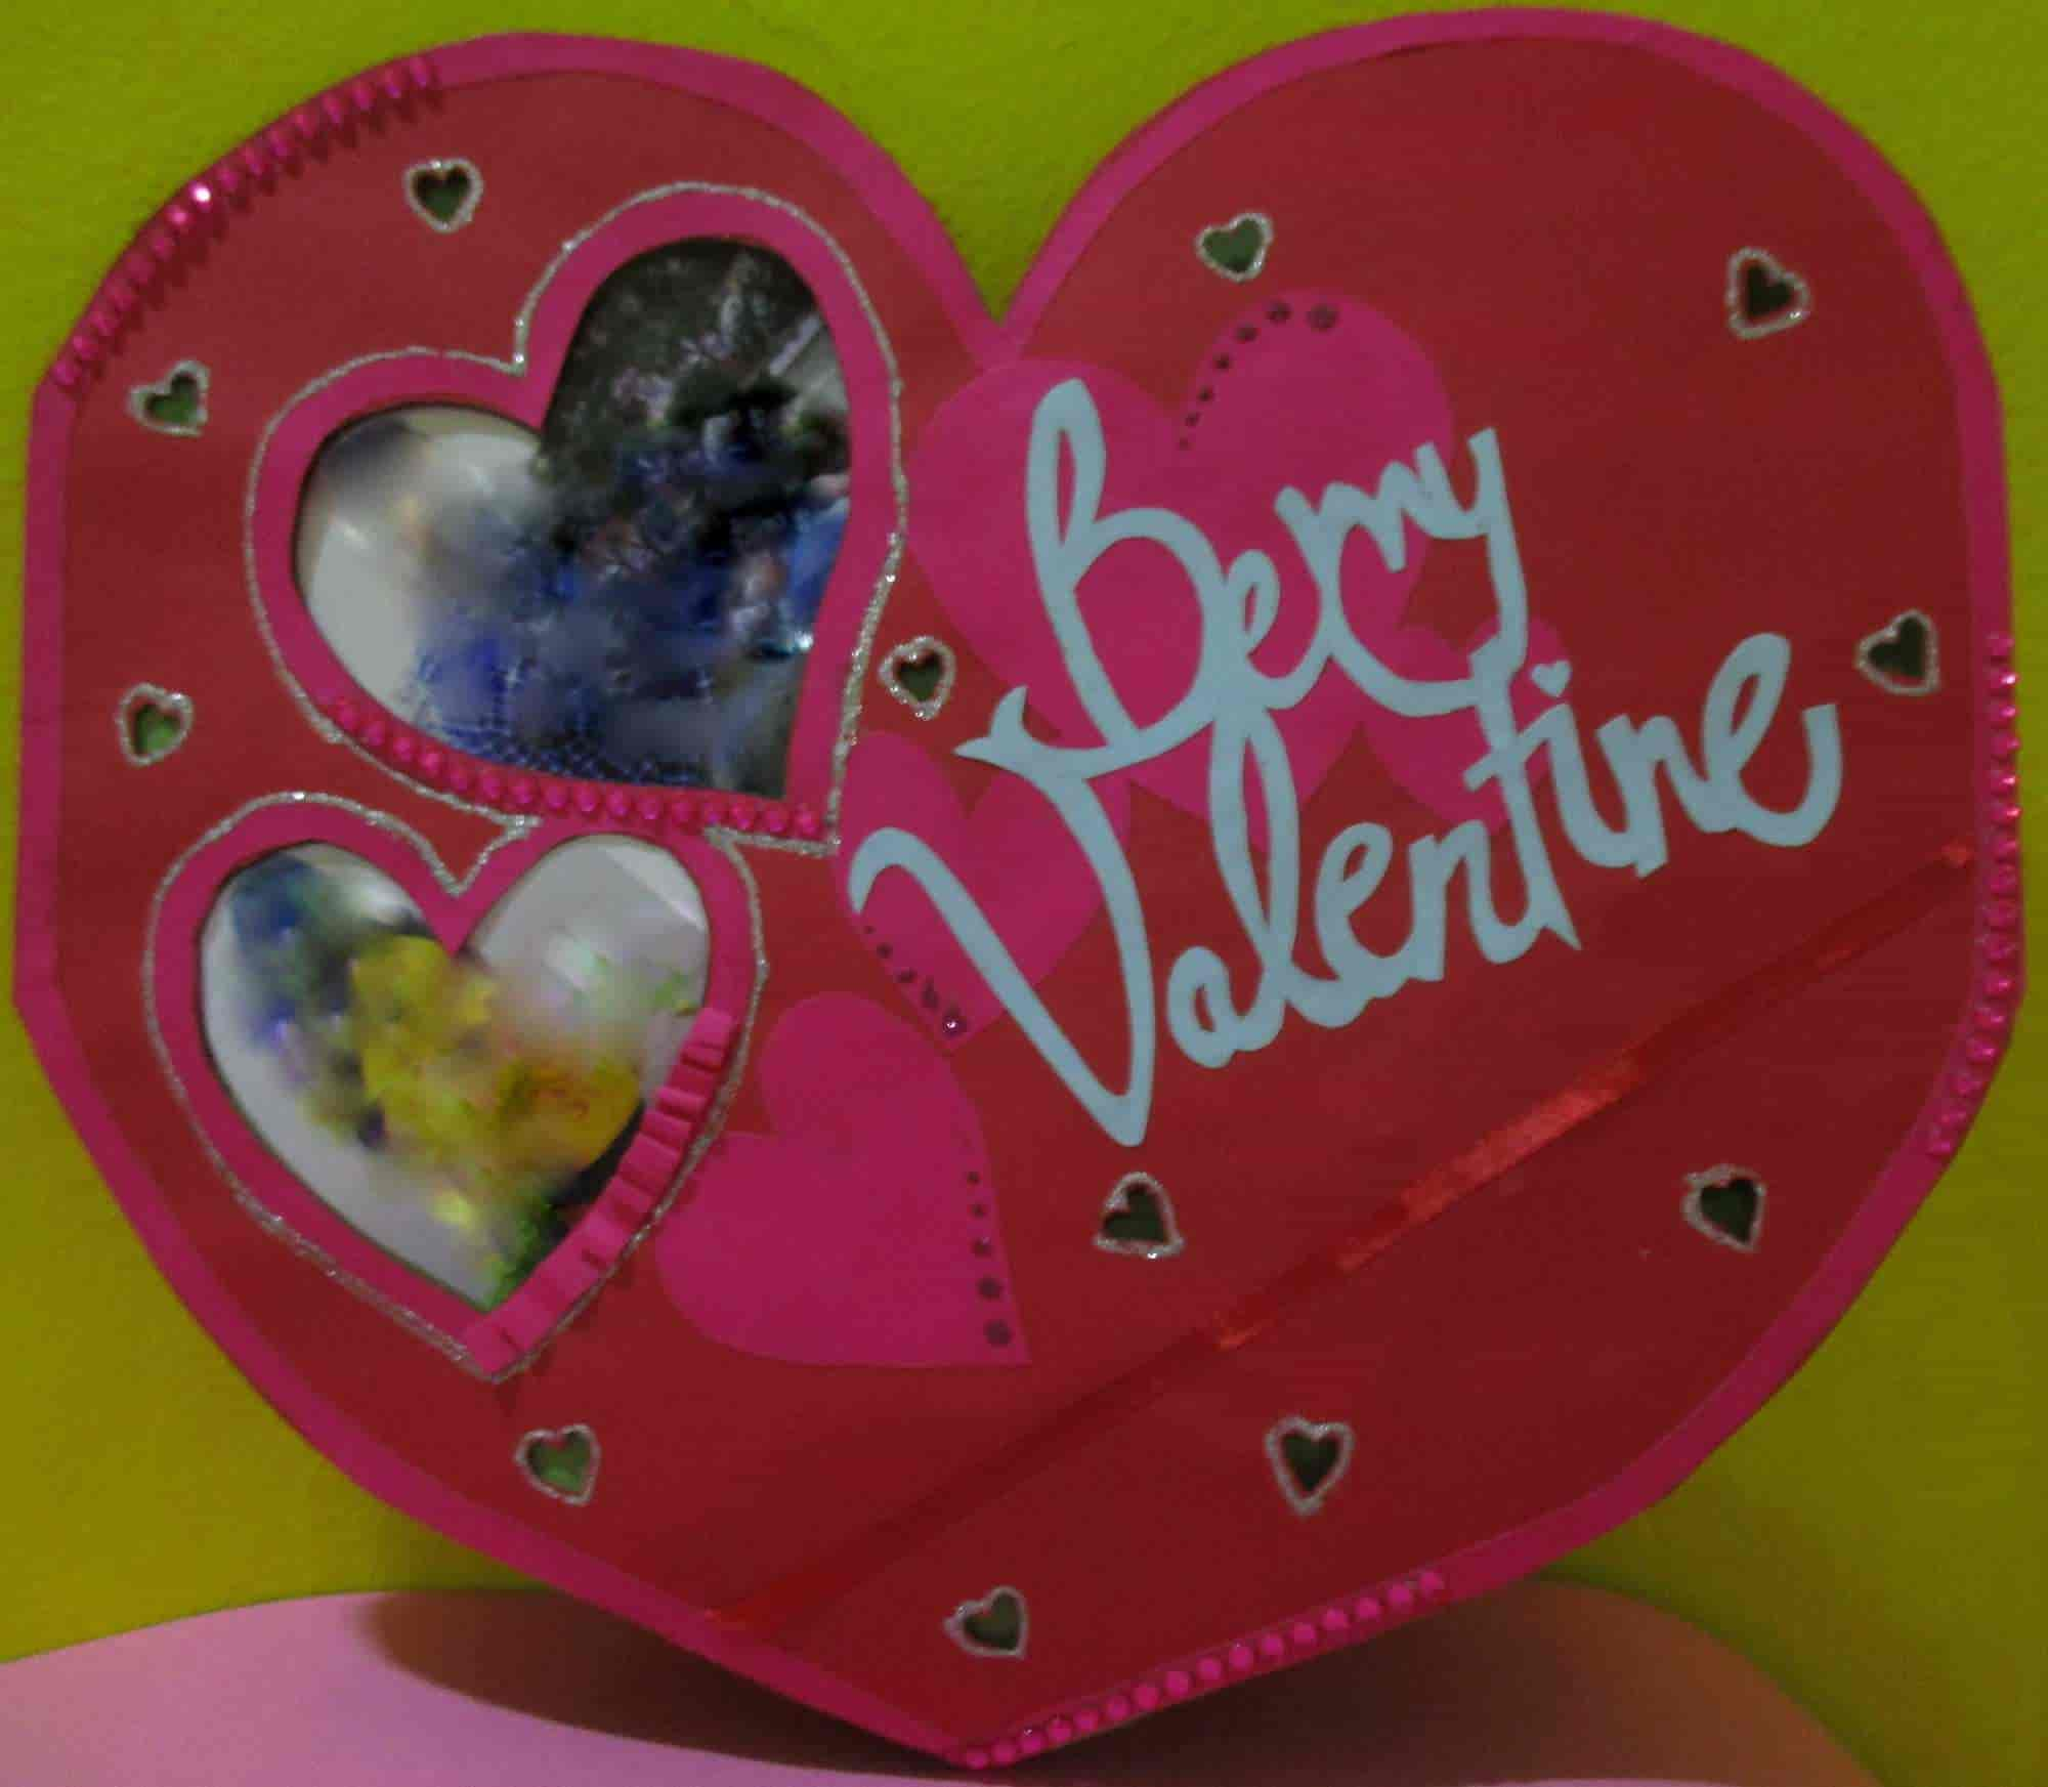 Minis designer greeting cards photos thergaon pune pictures greeting cards minis designer greeting cards photos thergaon pune greeting card dealers m4hsunfo